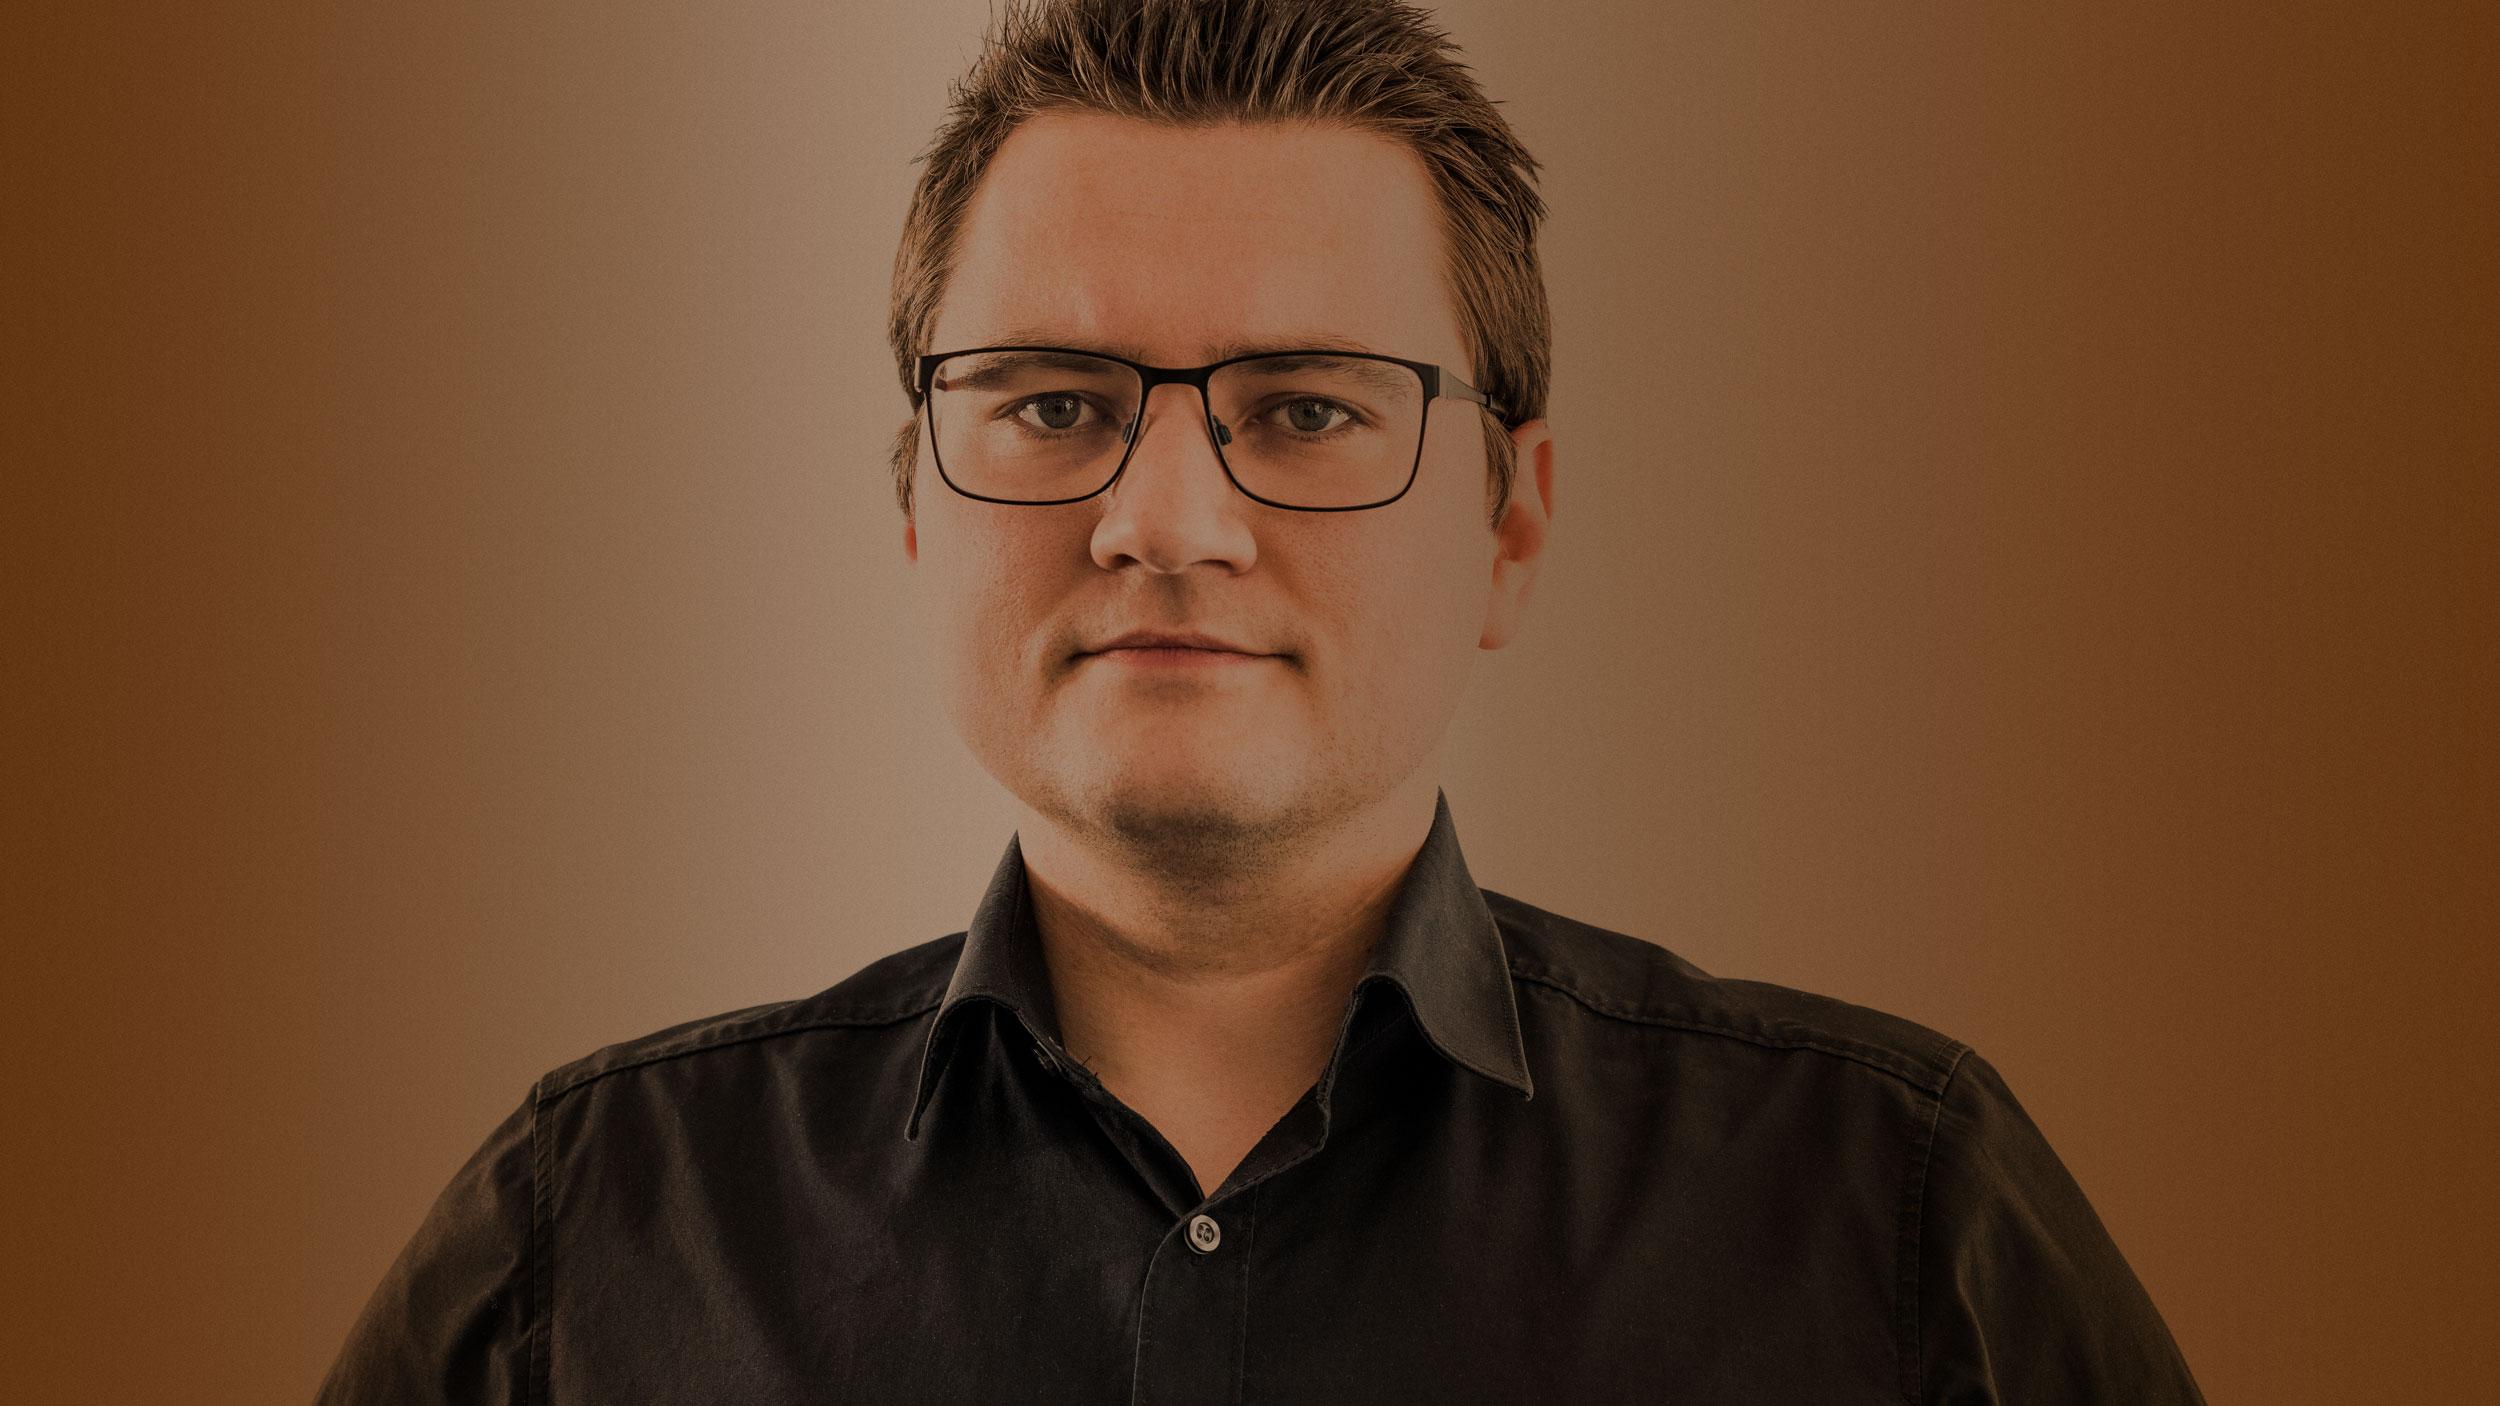 Falk Sturm: Fertigkeiten trainieren. Medizinisches Notfall-Management.